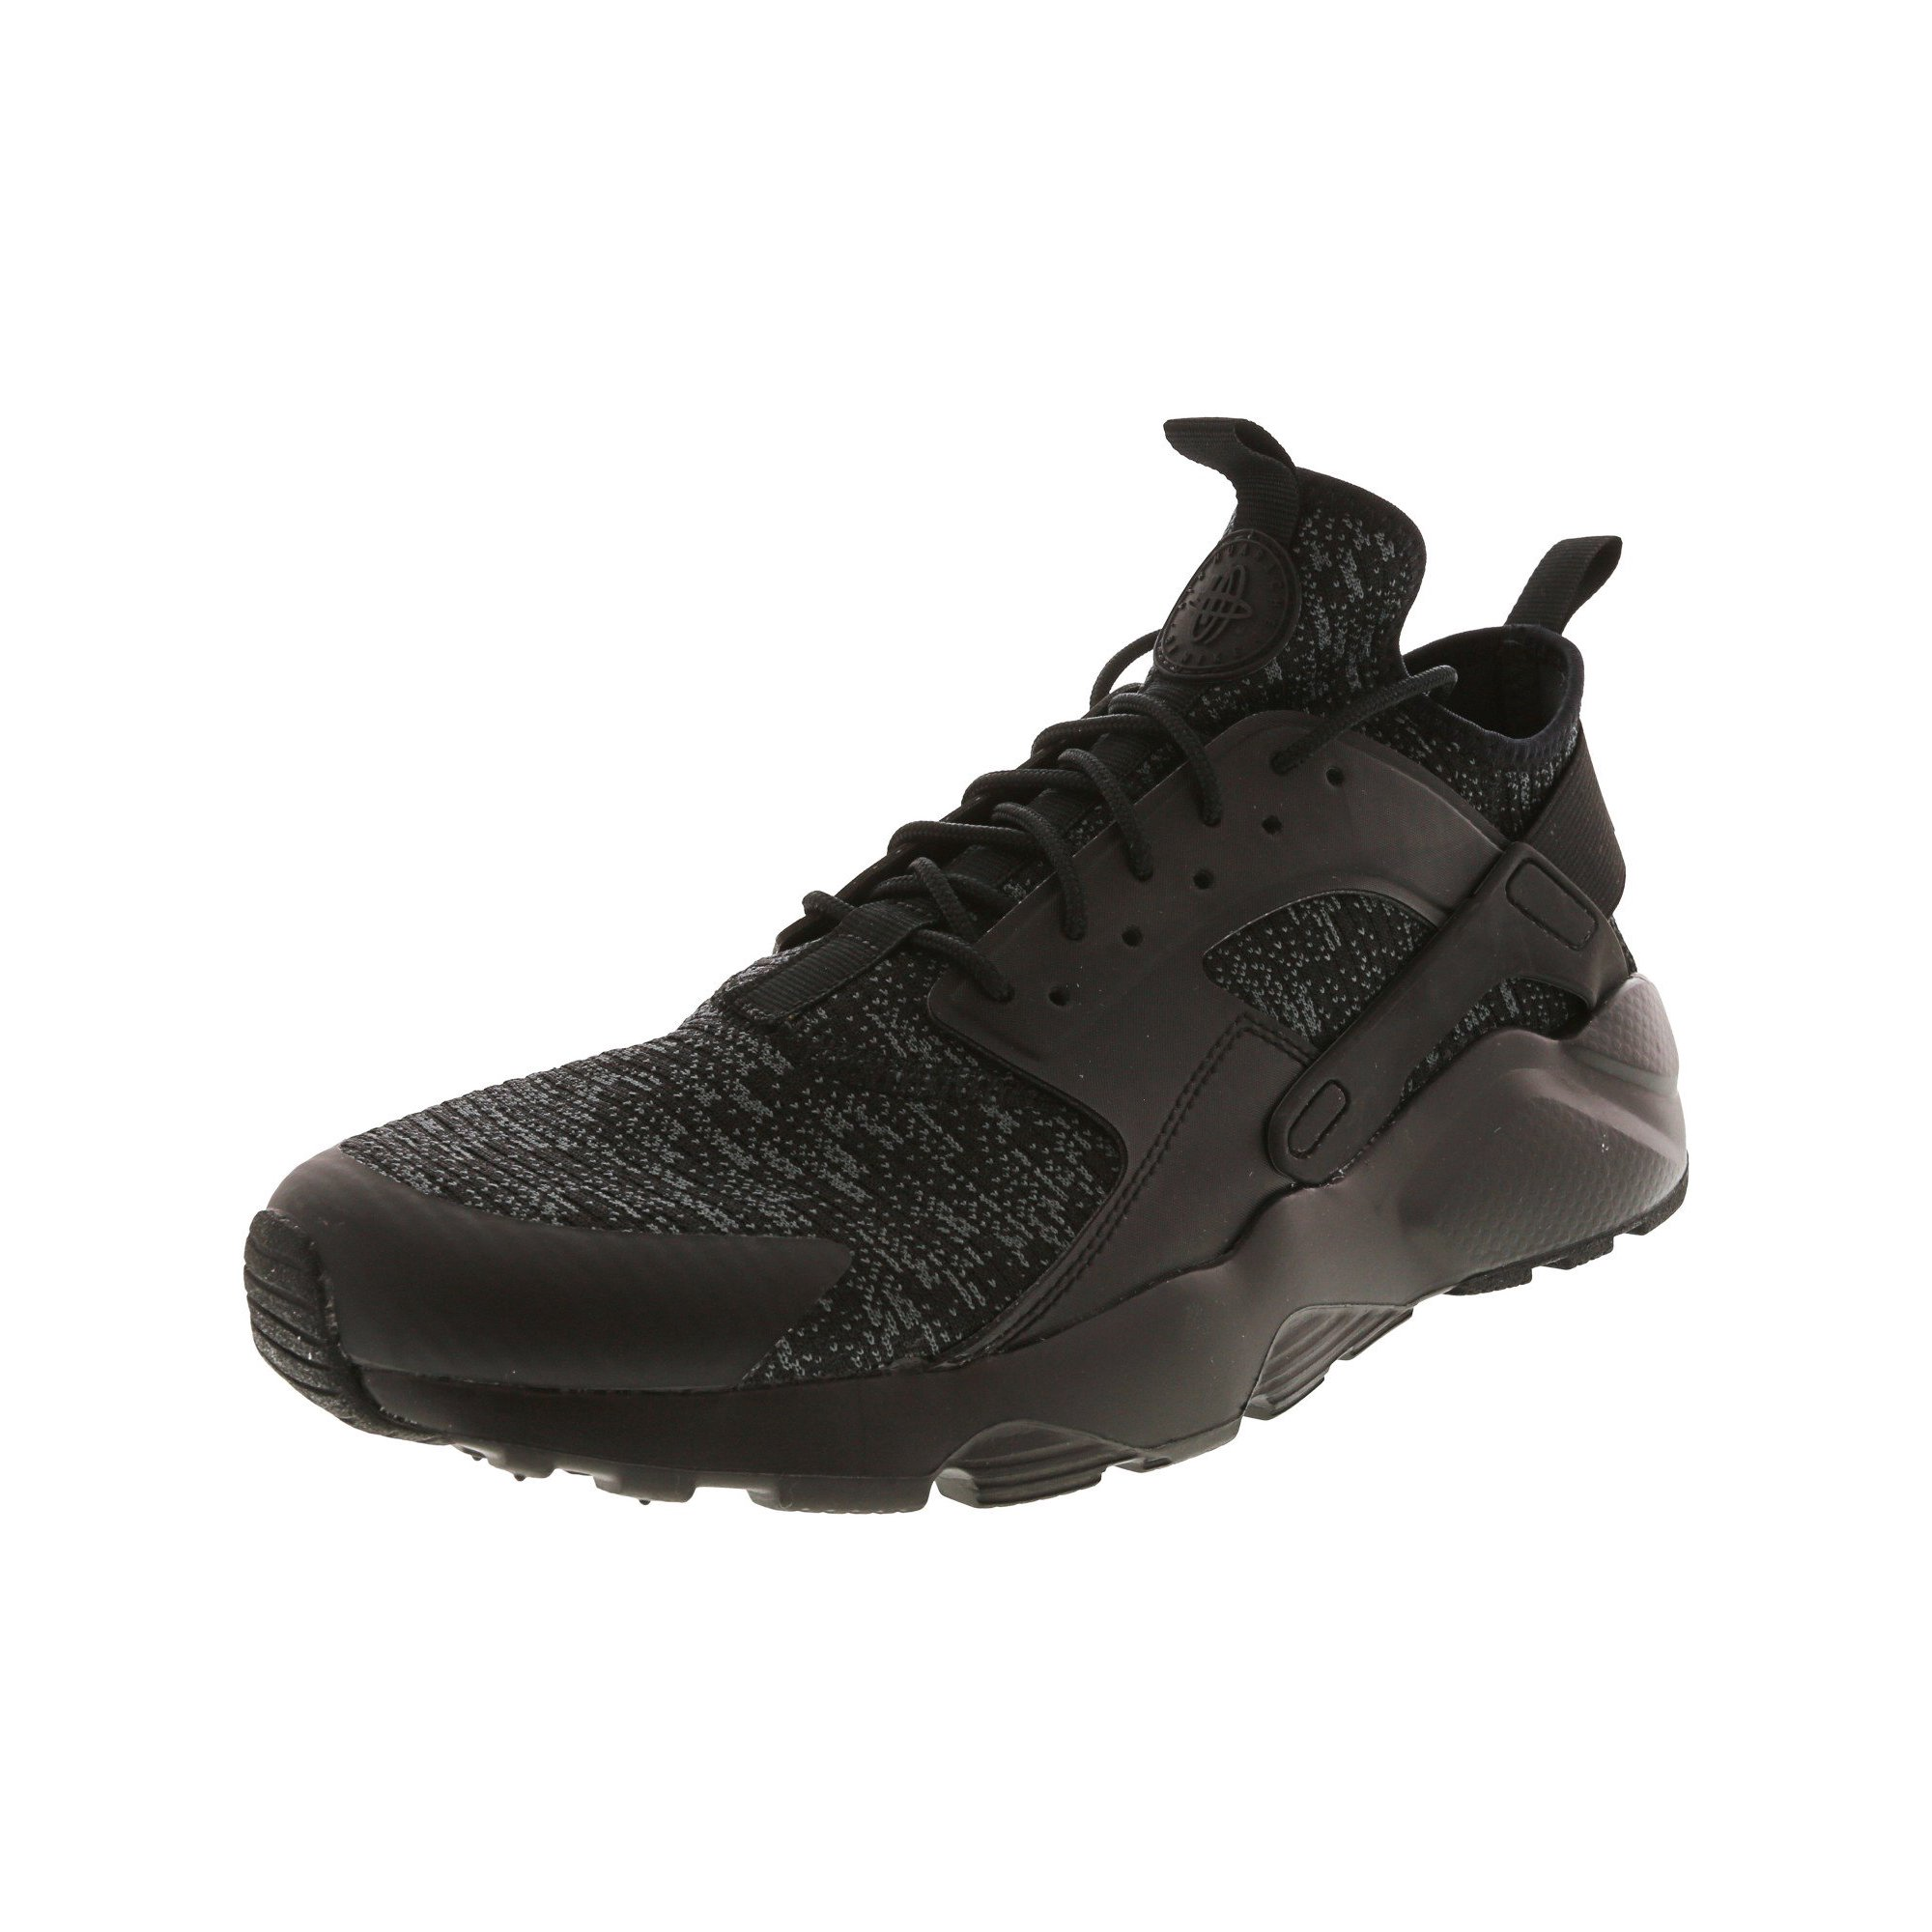 promo code d8489 f4ddd Nike Men's Air Huarache Run Ultra Se Black / - Dark Grey ...